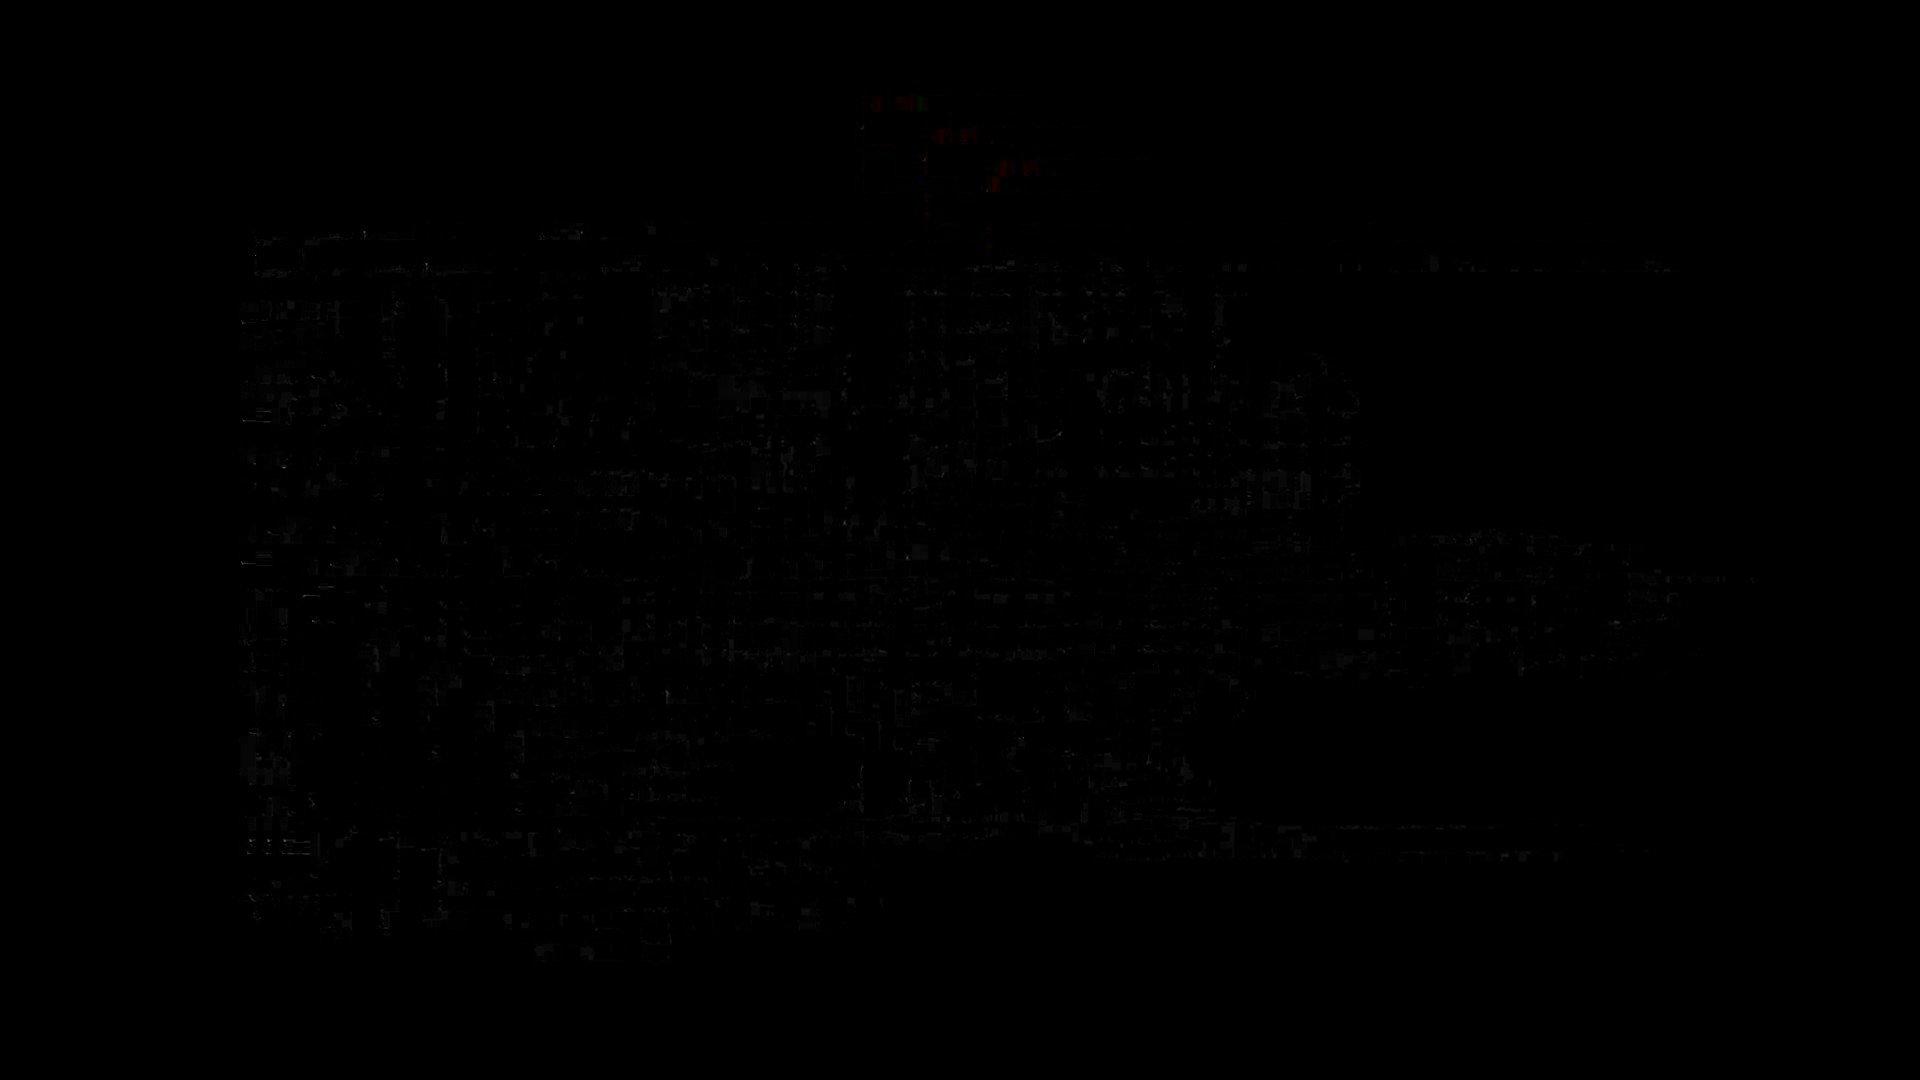 Aquaな露天風呂Vol.878潜入盗撮露天風呂十五判湯 其の八 美しいOLの裸体   潜入突撃  95pic 1